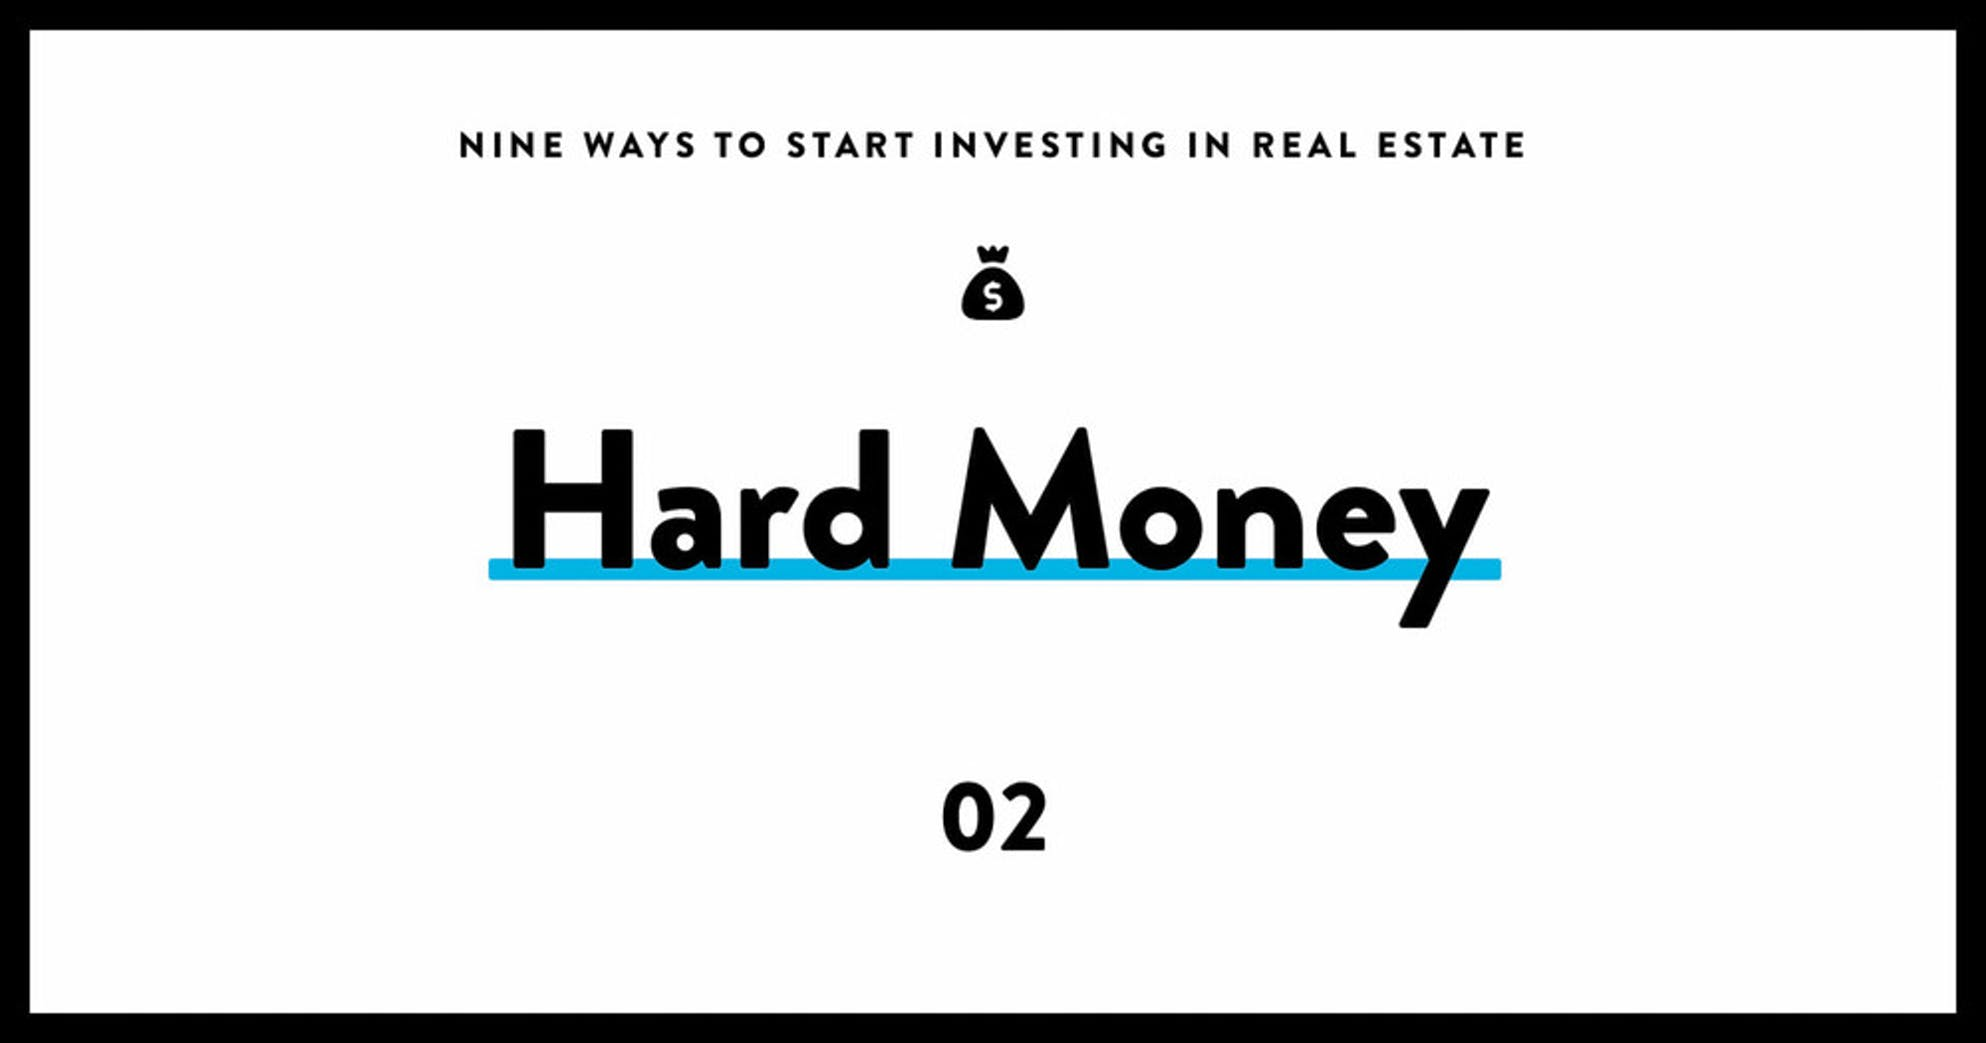 Start investing in real estate 02 hard money